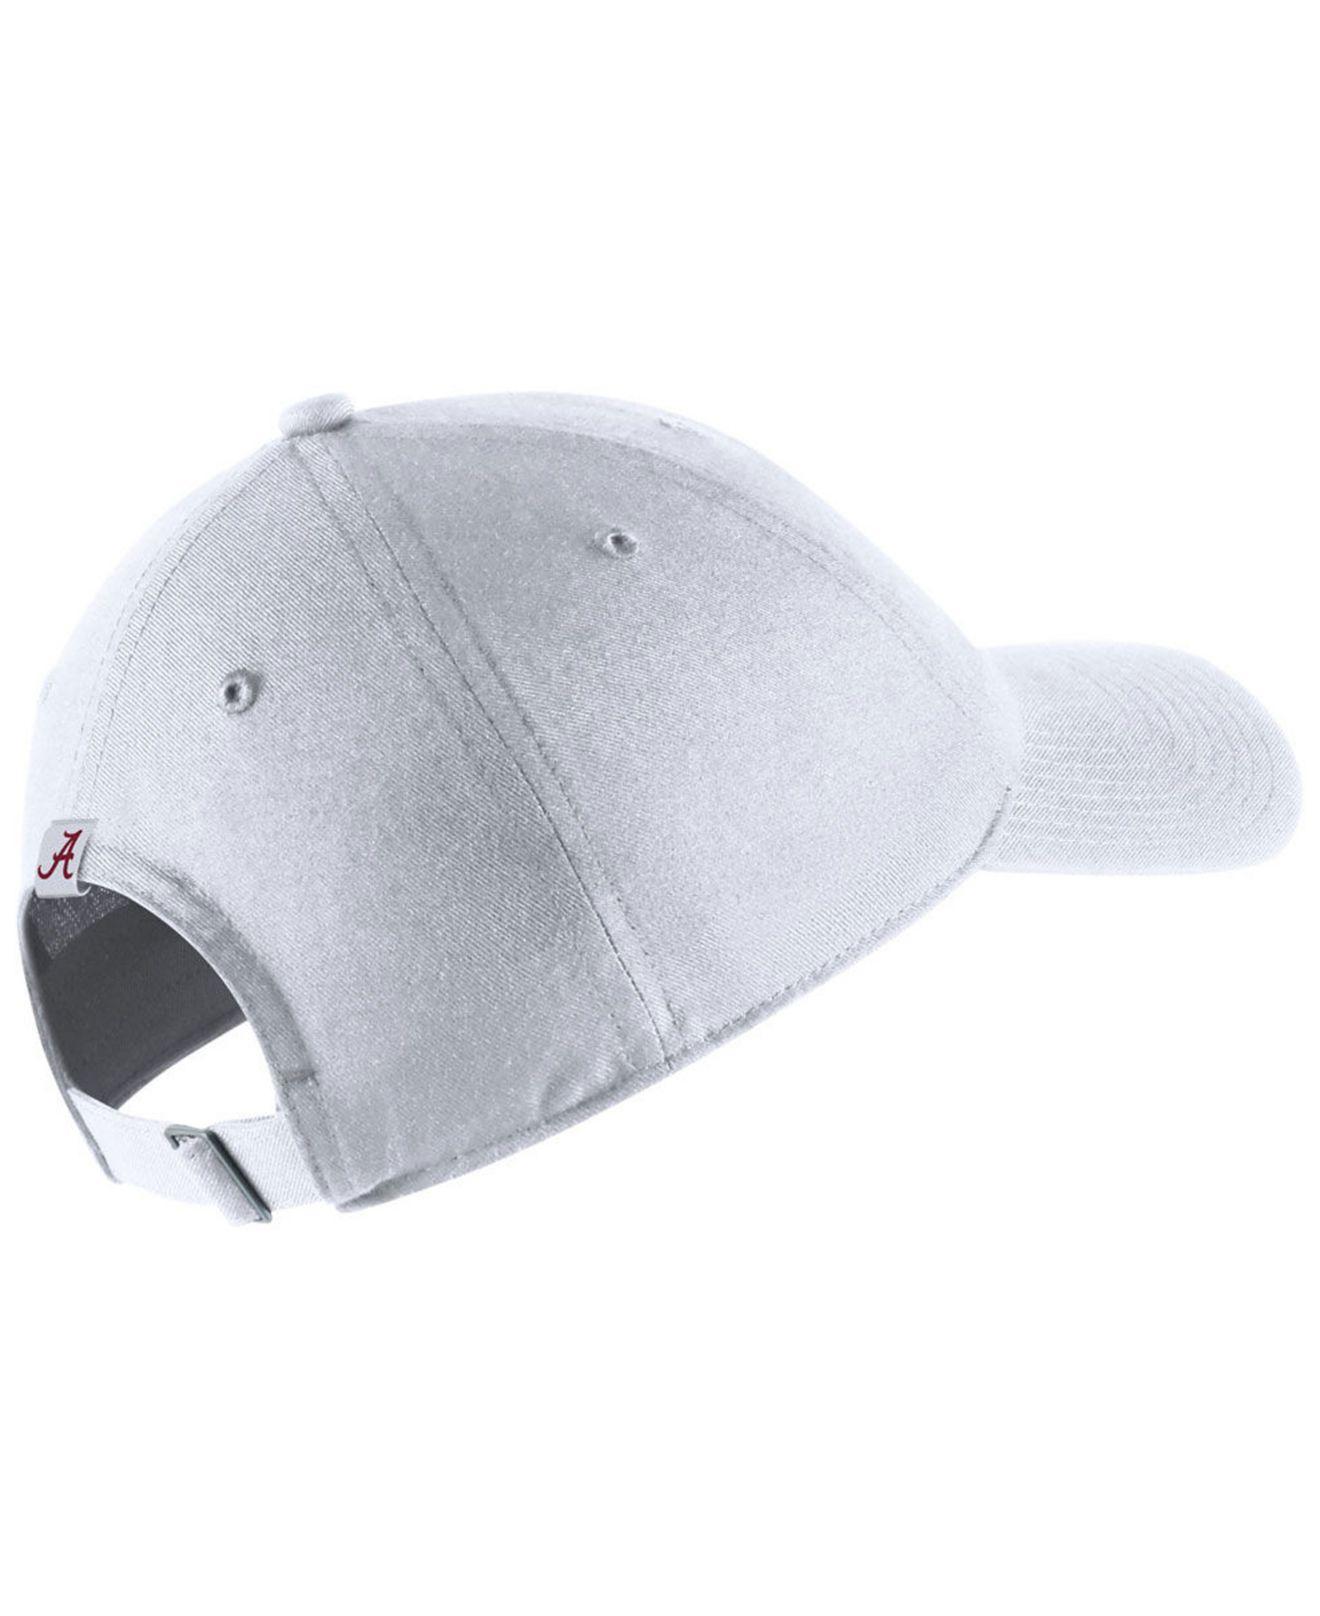 finest selection 86432 4c1d6 Lyst - Nike Alabama Crimson Tide H86 Wordmark Swoosh Cap in White for Men